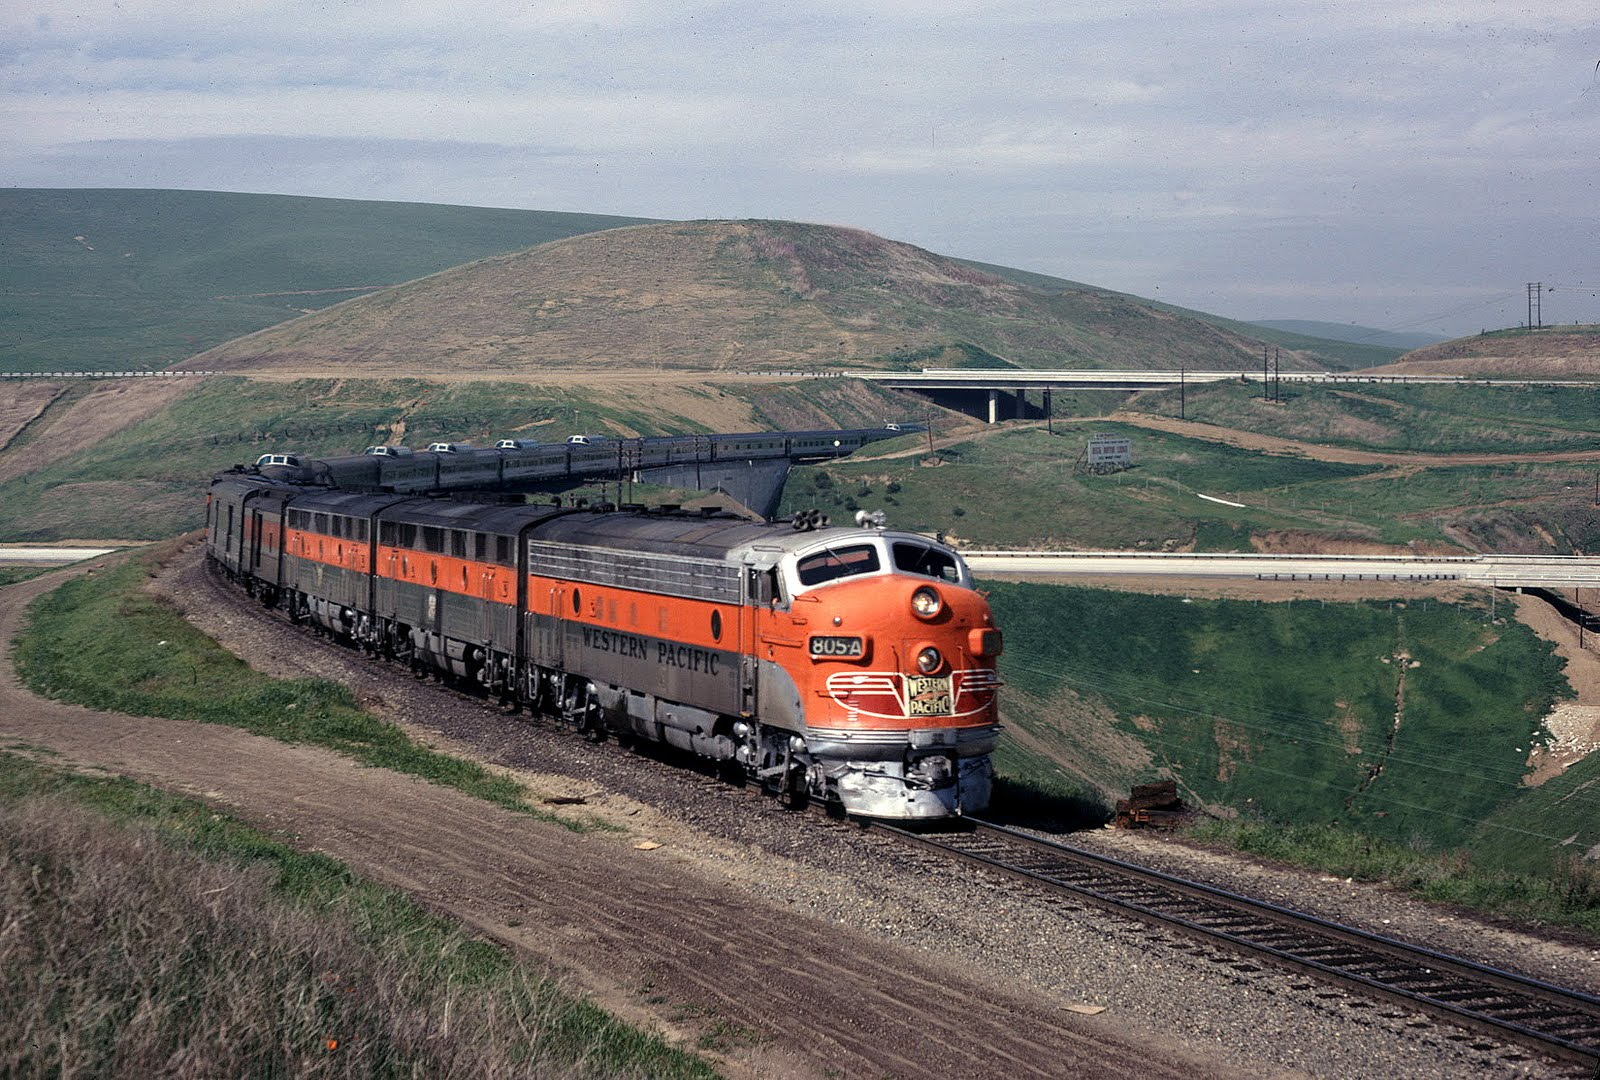 Transpress Nz Western Pacific On Altamont Pass